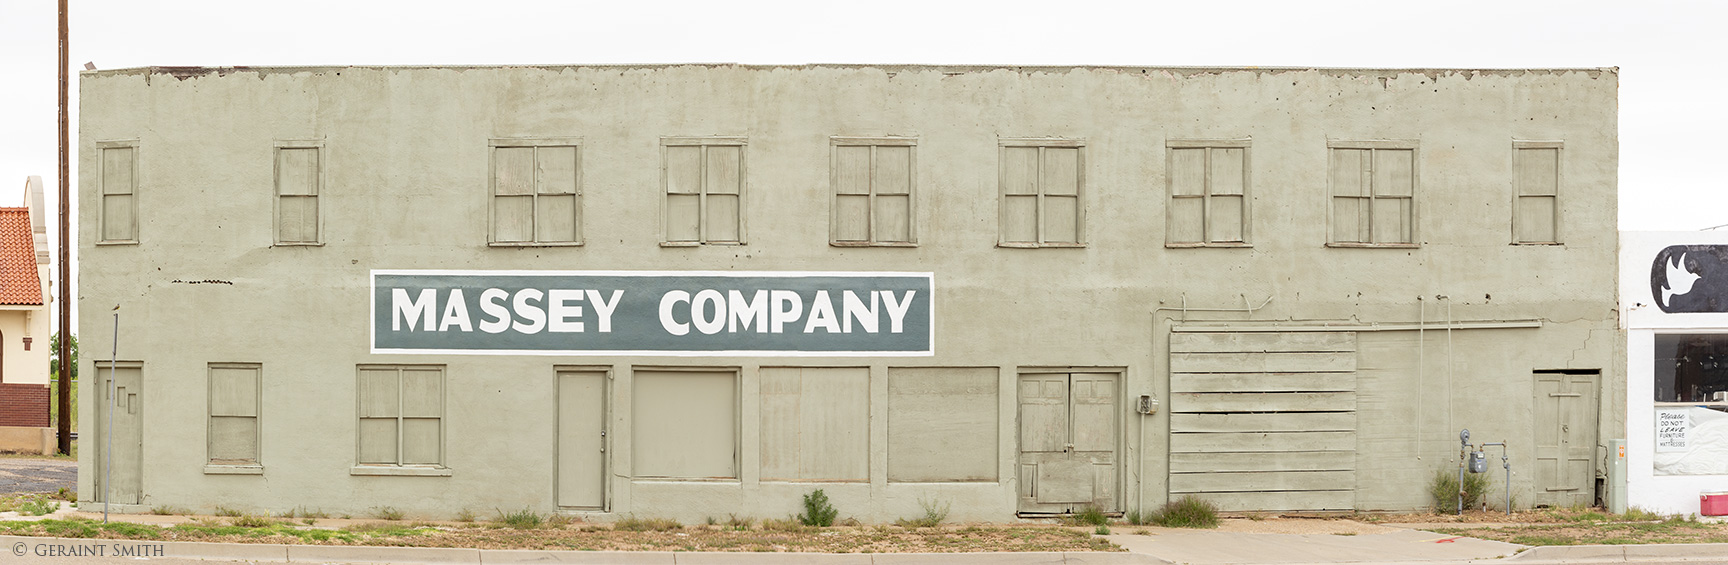 Massey Company, Tucumcari, NM